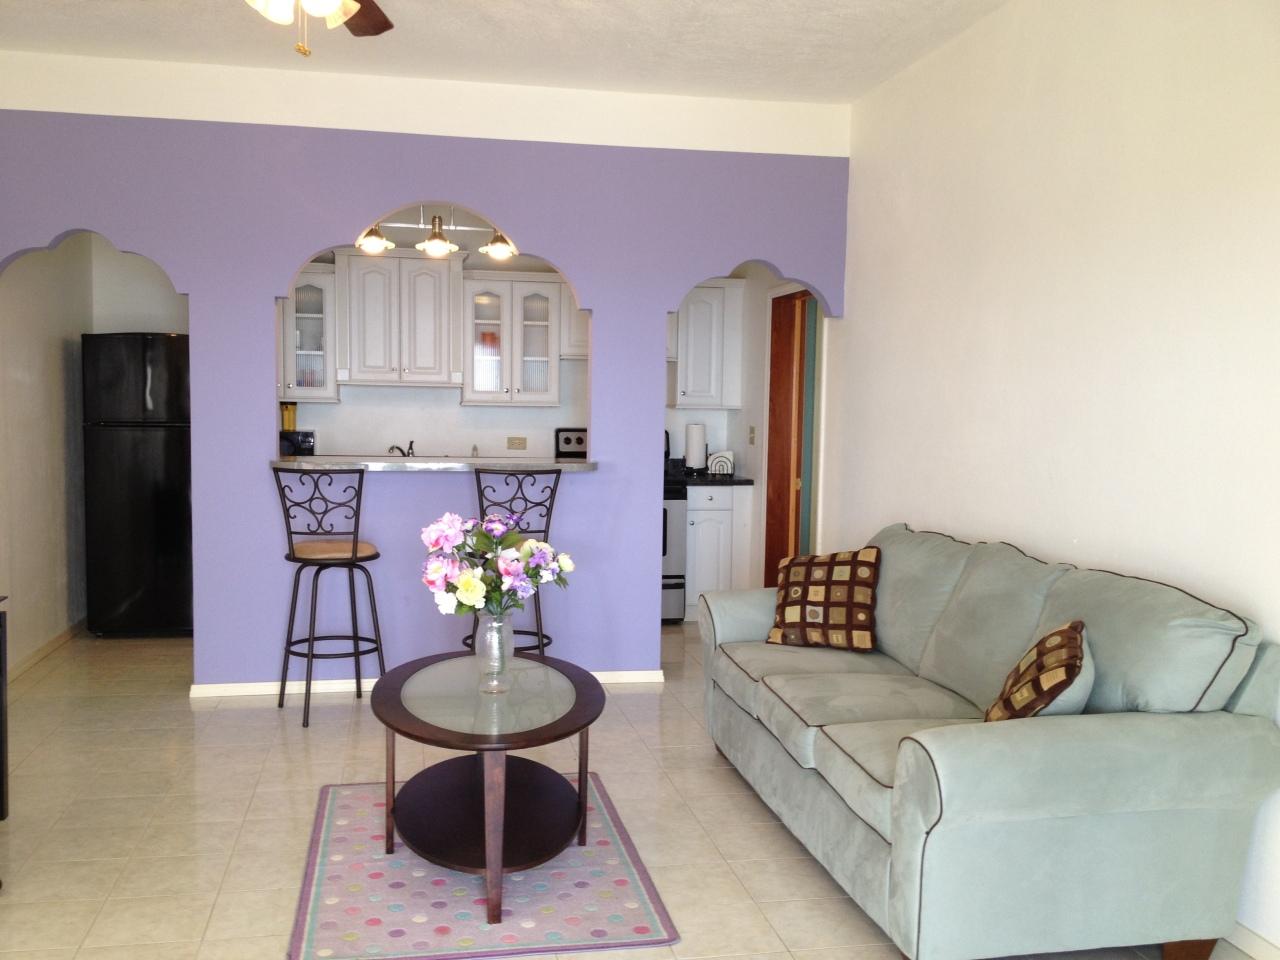 Multi-Family Home for Rent at 11-14 #1 Sorgenfri SS 11-14 #1 Sorgenfri SS St Thomas, Virgin Islands 00802 United States Virgin Islands